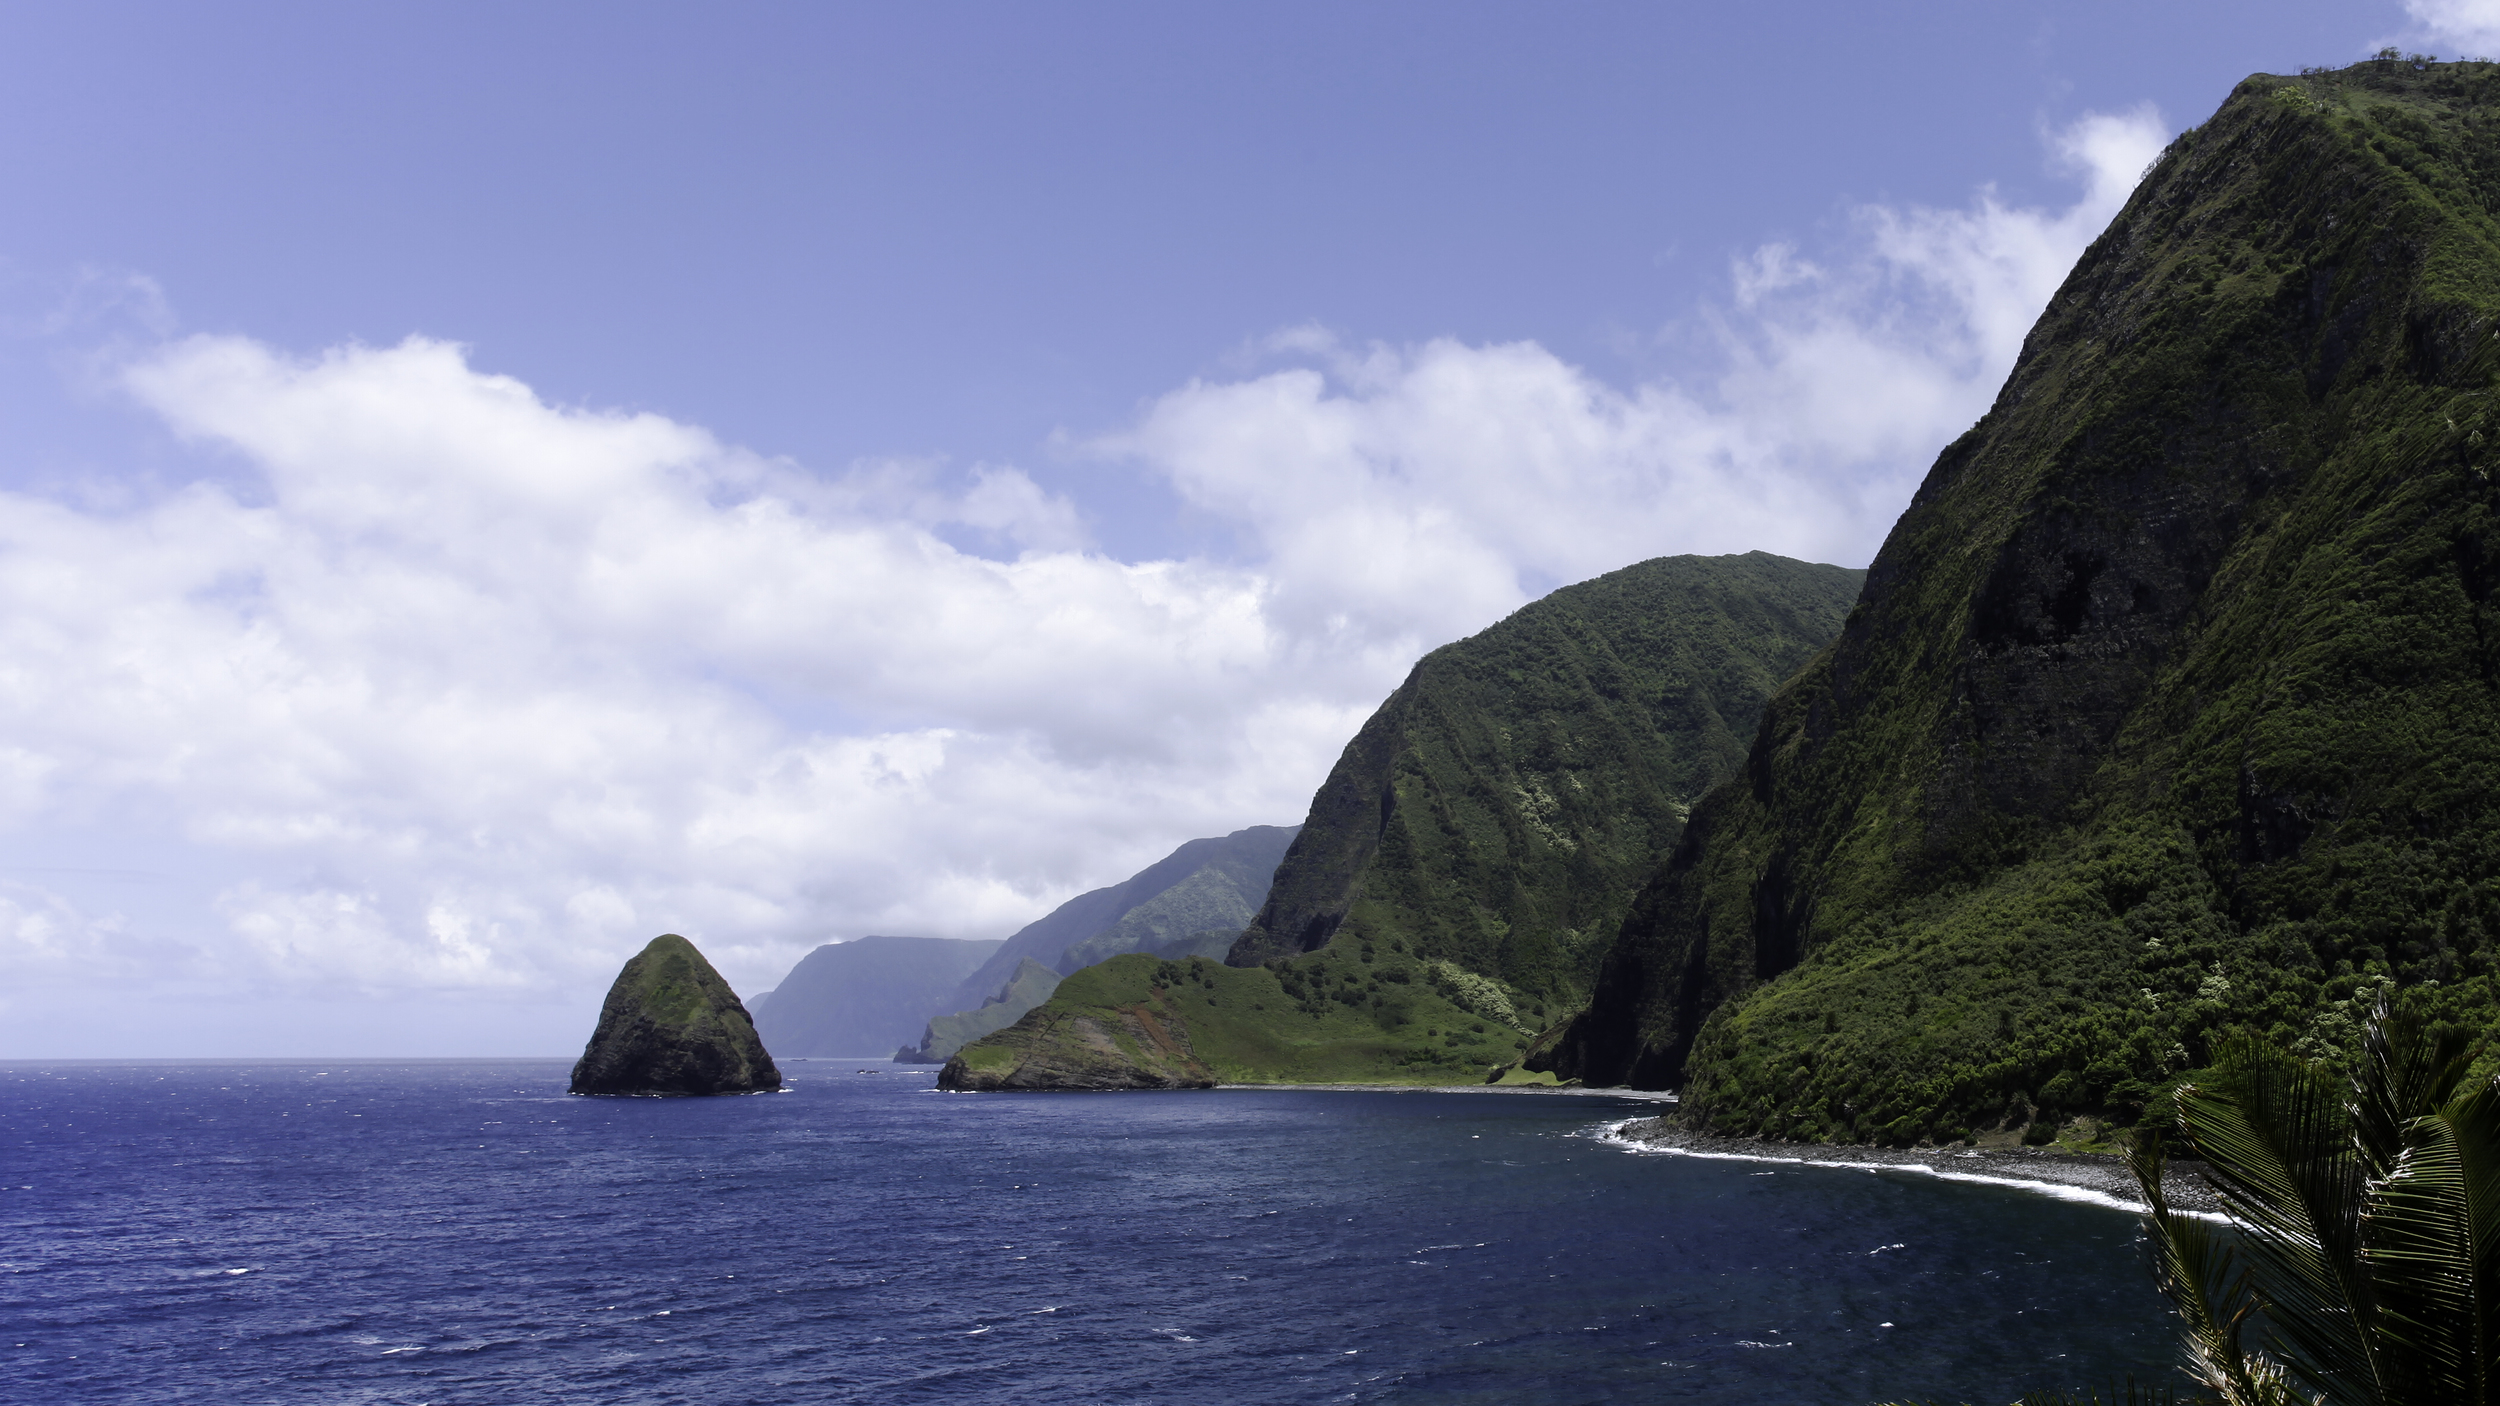 (1) Kalaupapa, Molokai